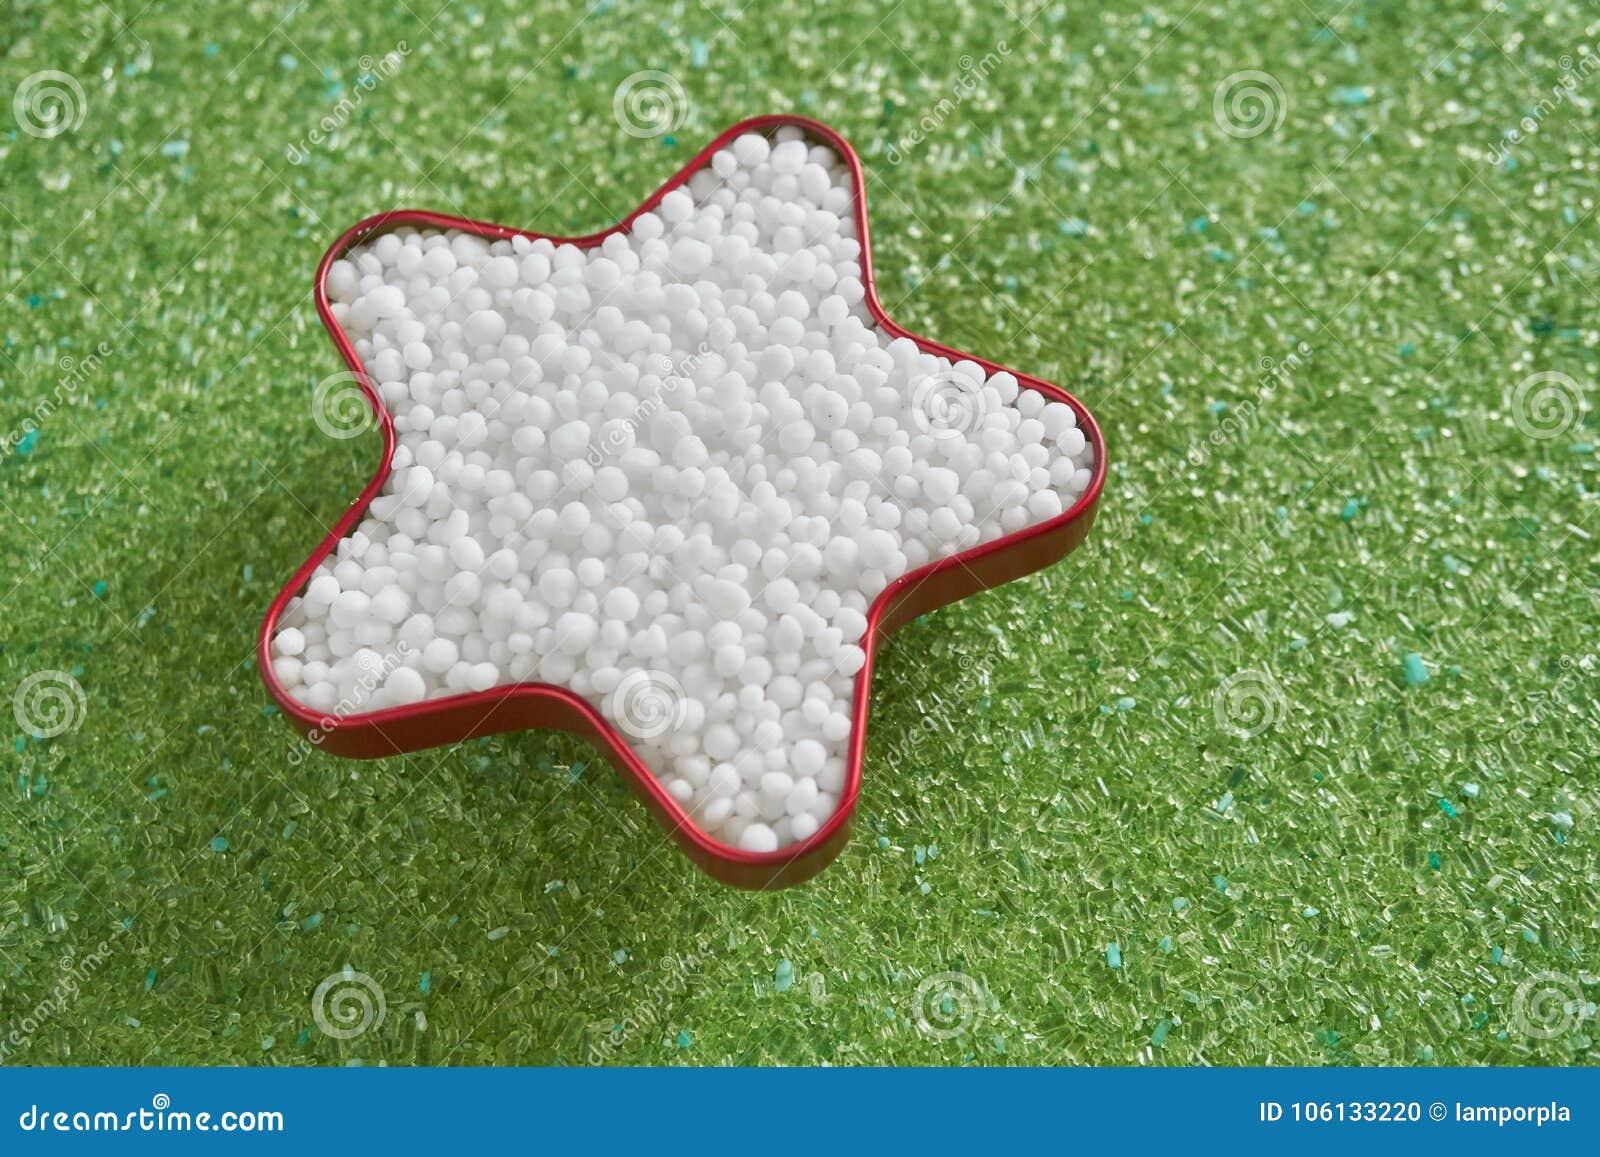 Urea fertilizer in star shape on green magnesium fertilizer